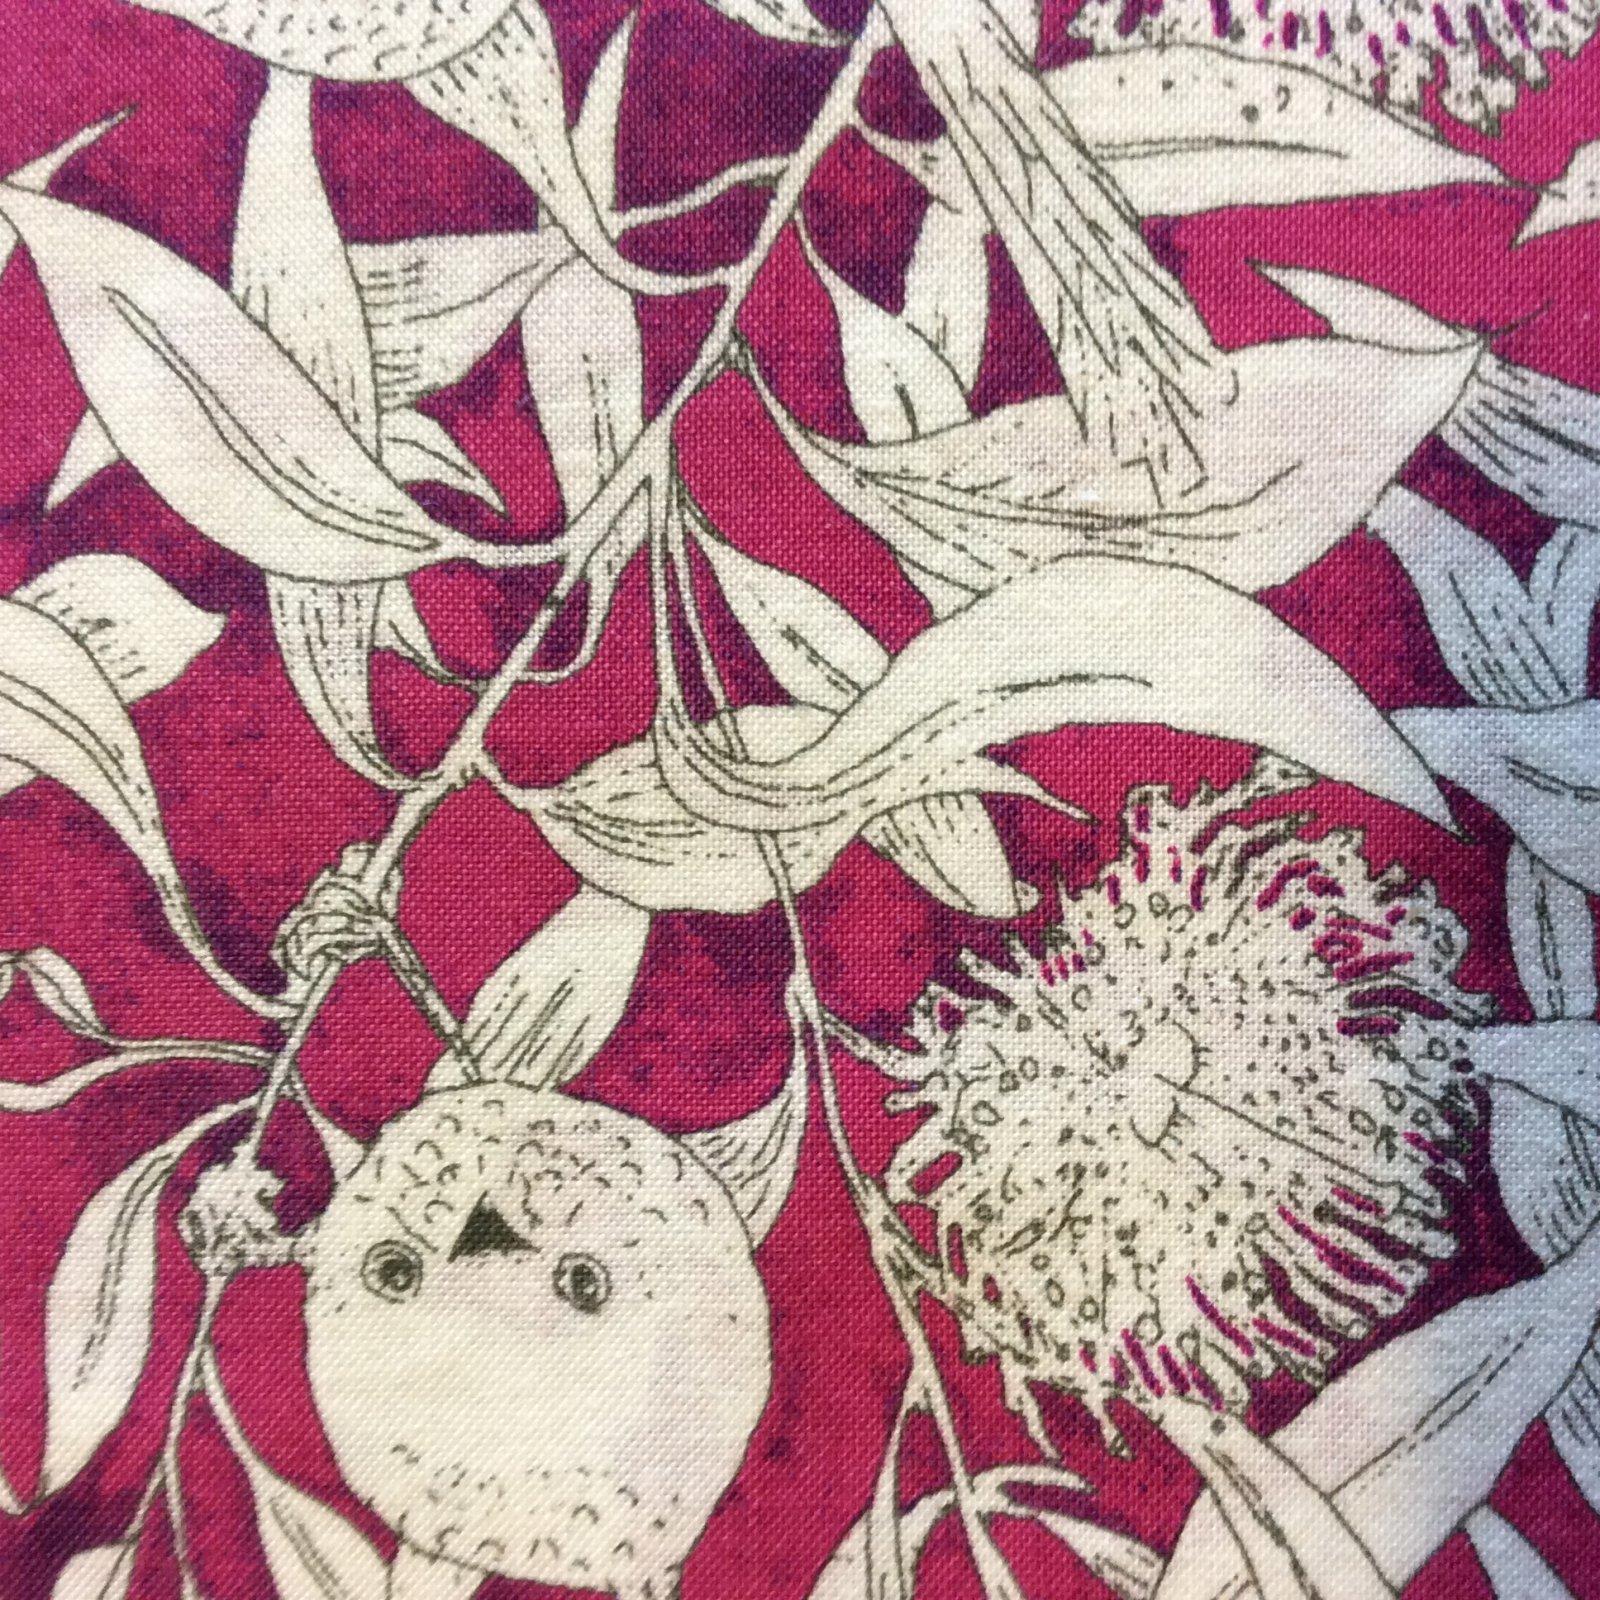 MS04 Tropical Floral Birds Australia Leaves Aborigine Quilting Cotton Fabric